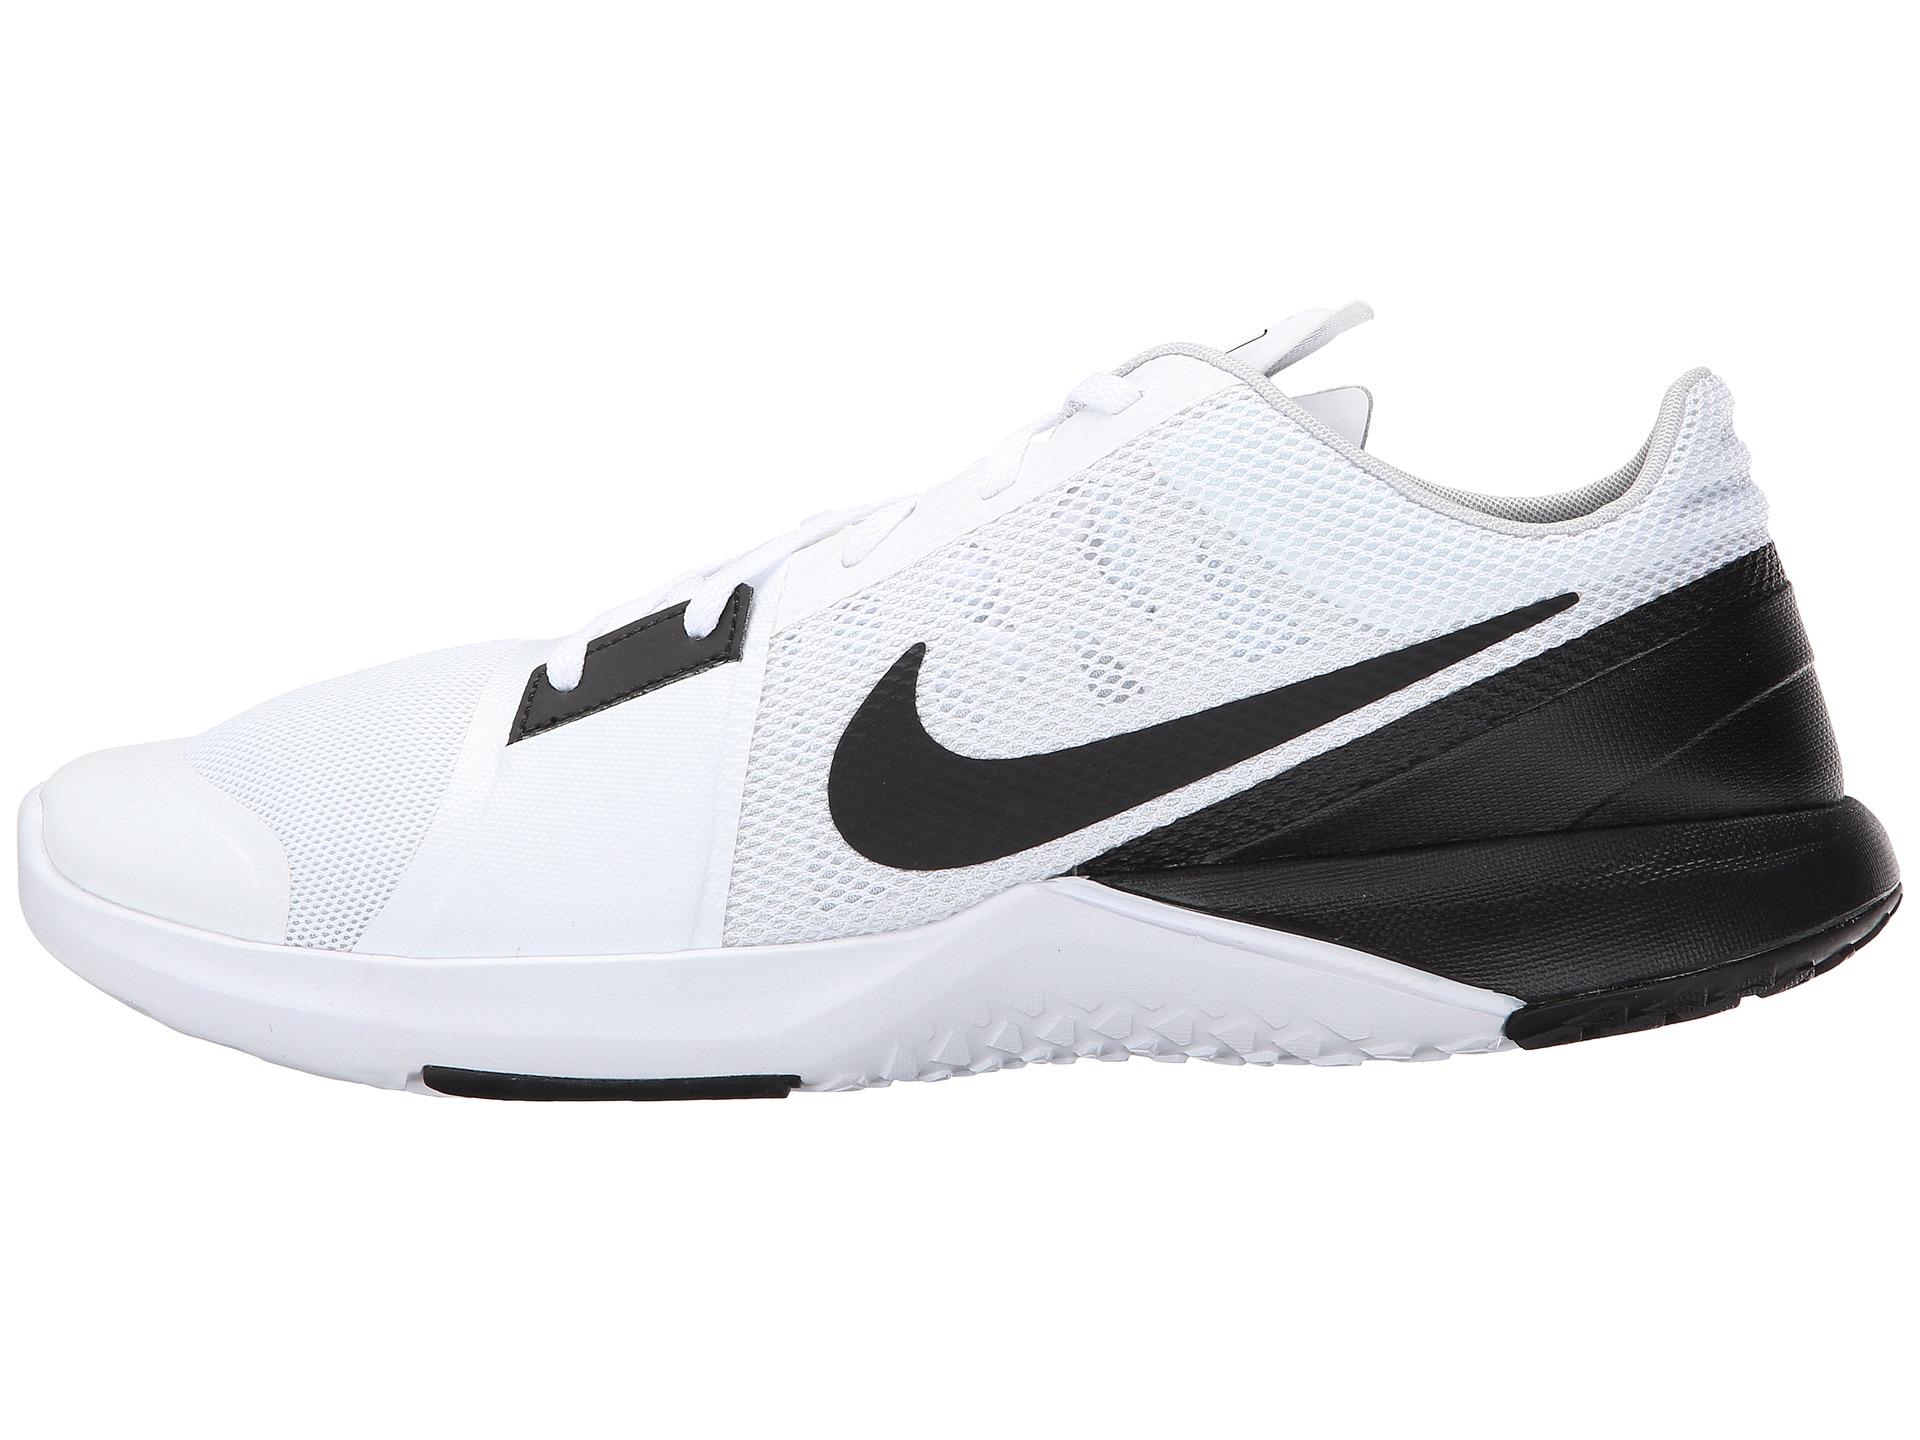 newest 82a75 0dea2 Nike White Fs Lite Trainer 3 for men